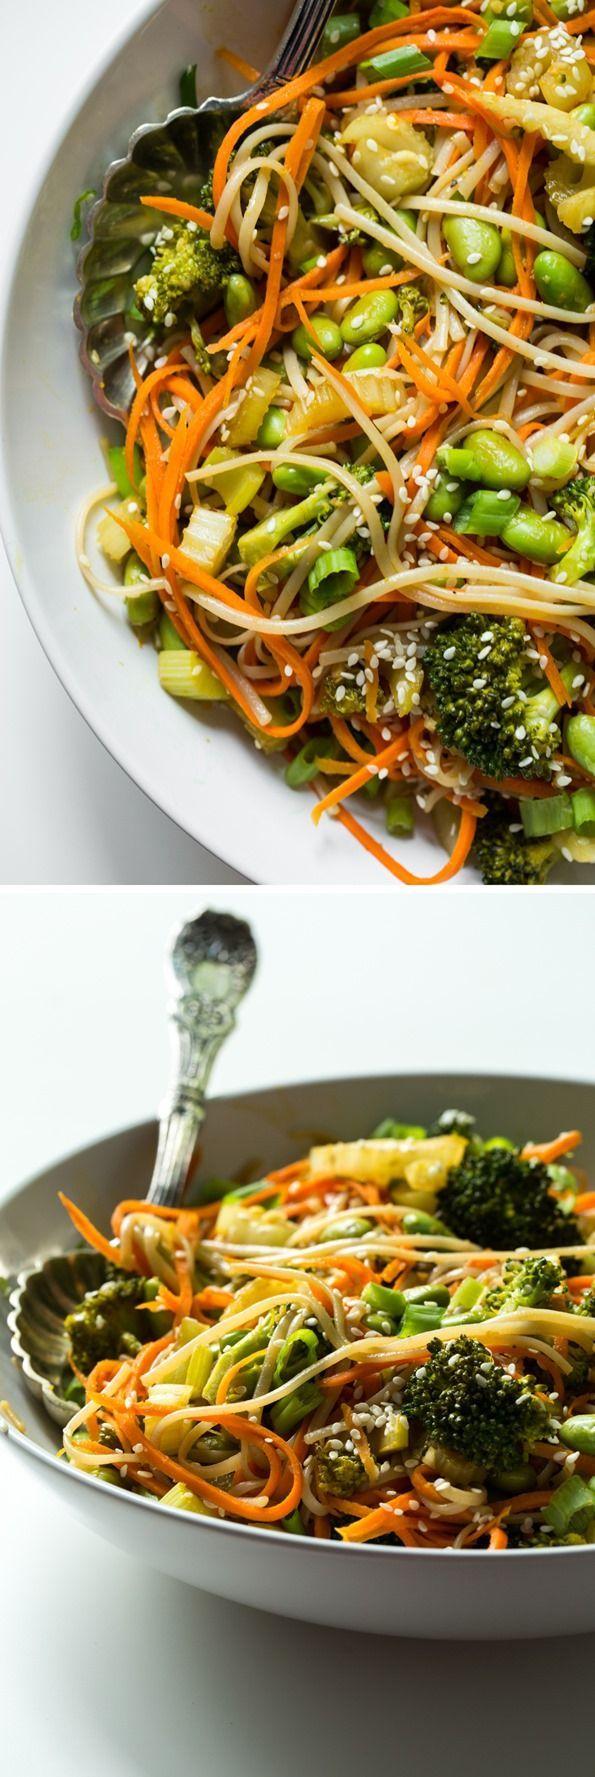 Speedy Veggie Noodle Bowl w/ Homemade Teriyaki Sauce